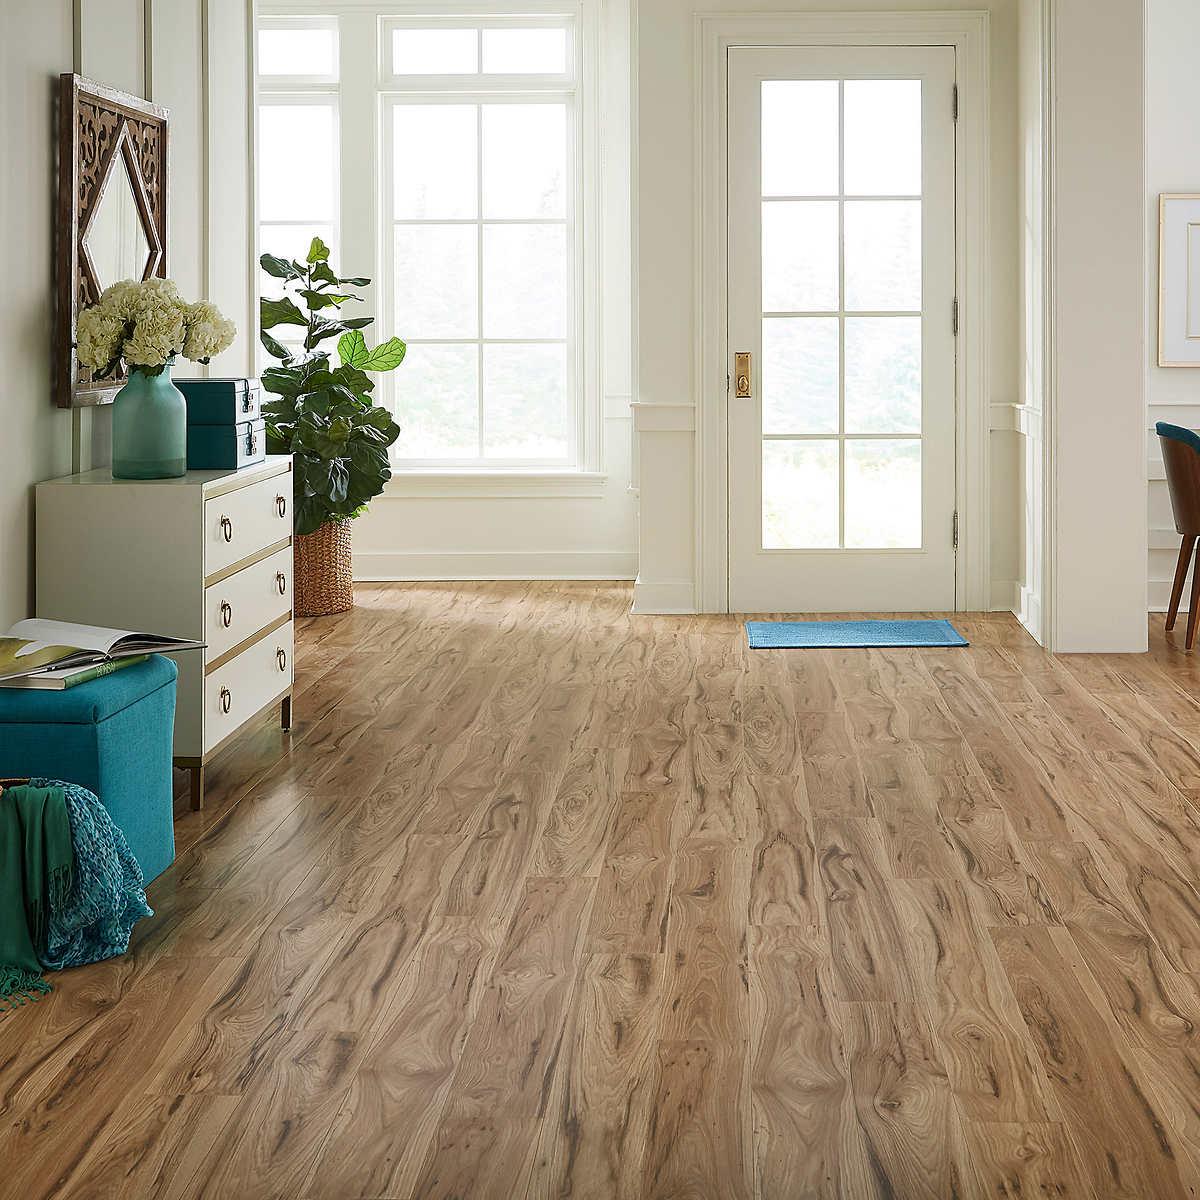 Mohawk Home Millport Hickory Waterproof, Mohawk Waterproof Laminate Flooring